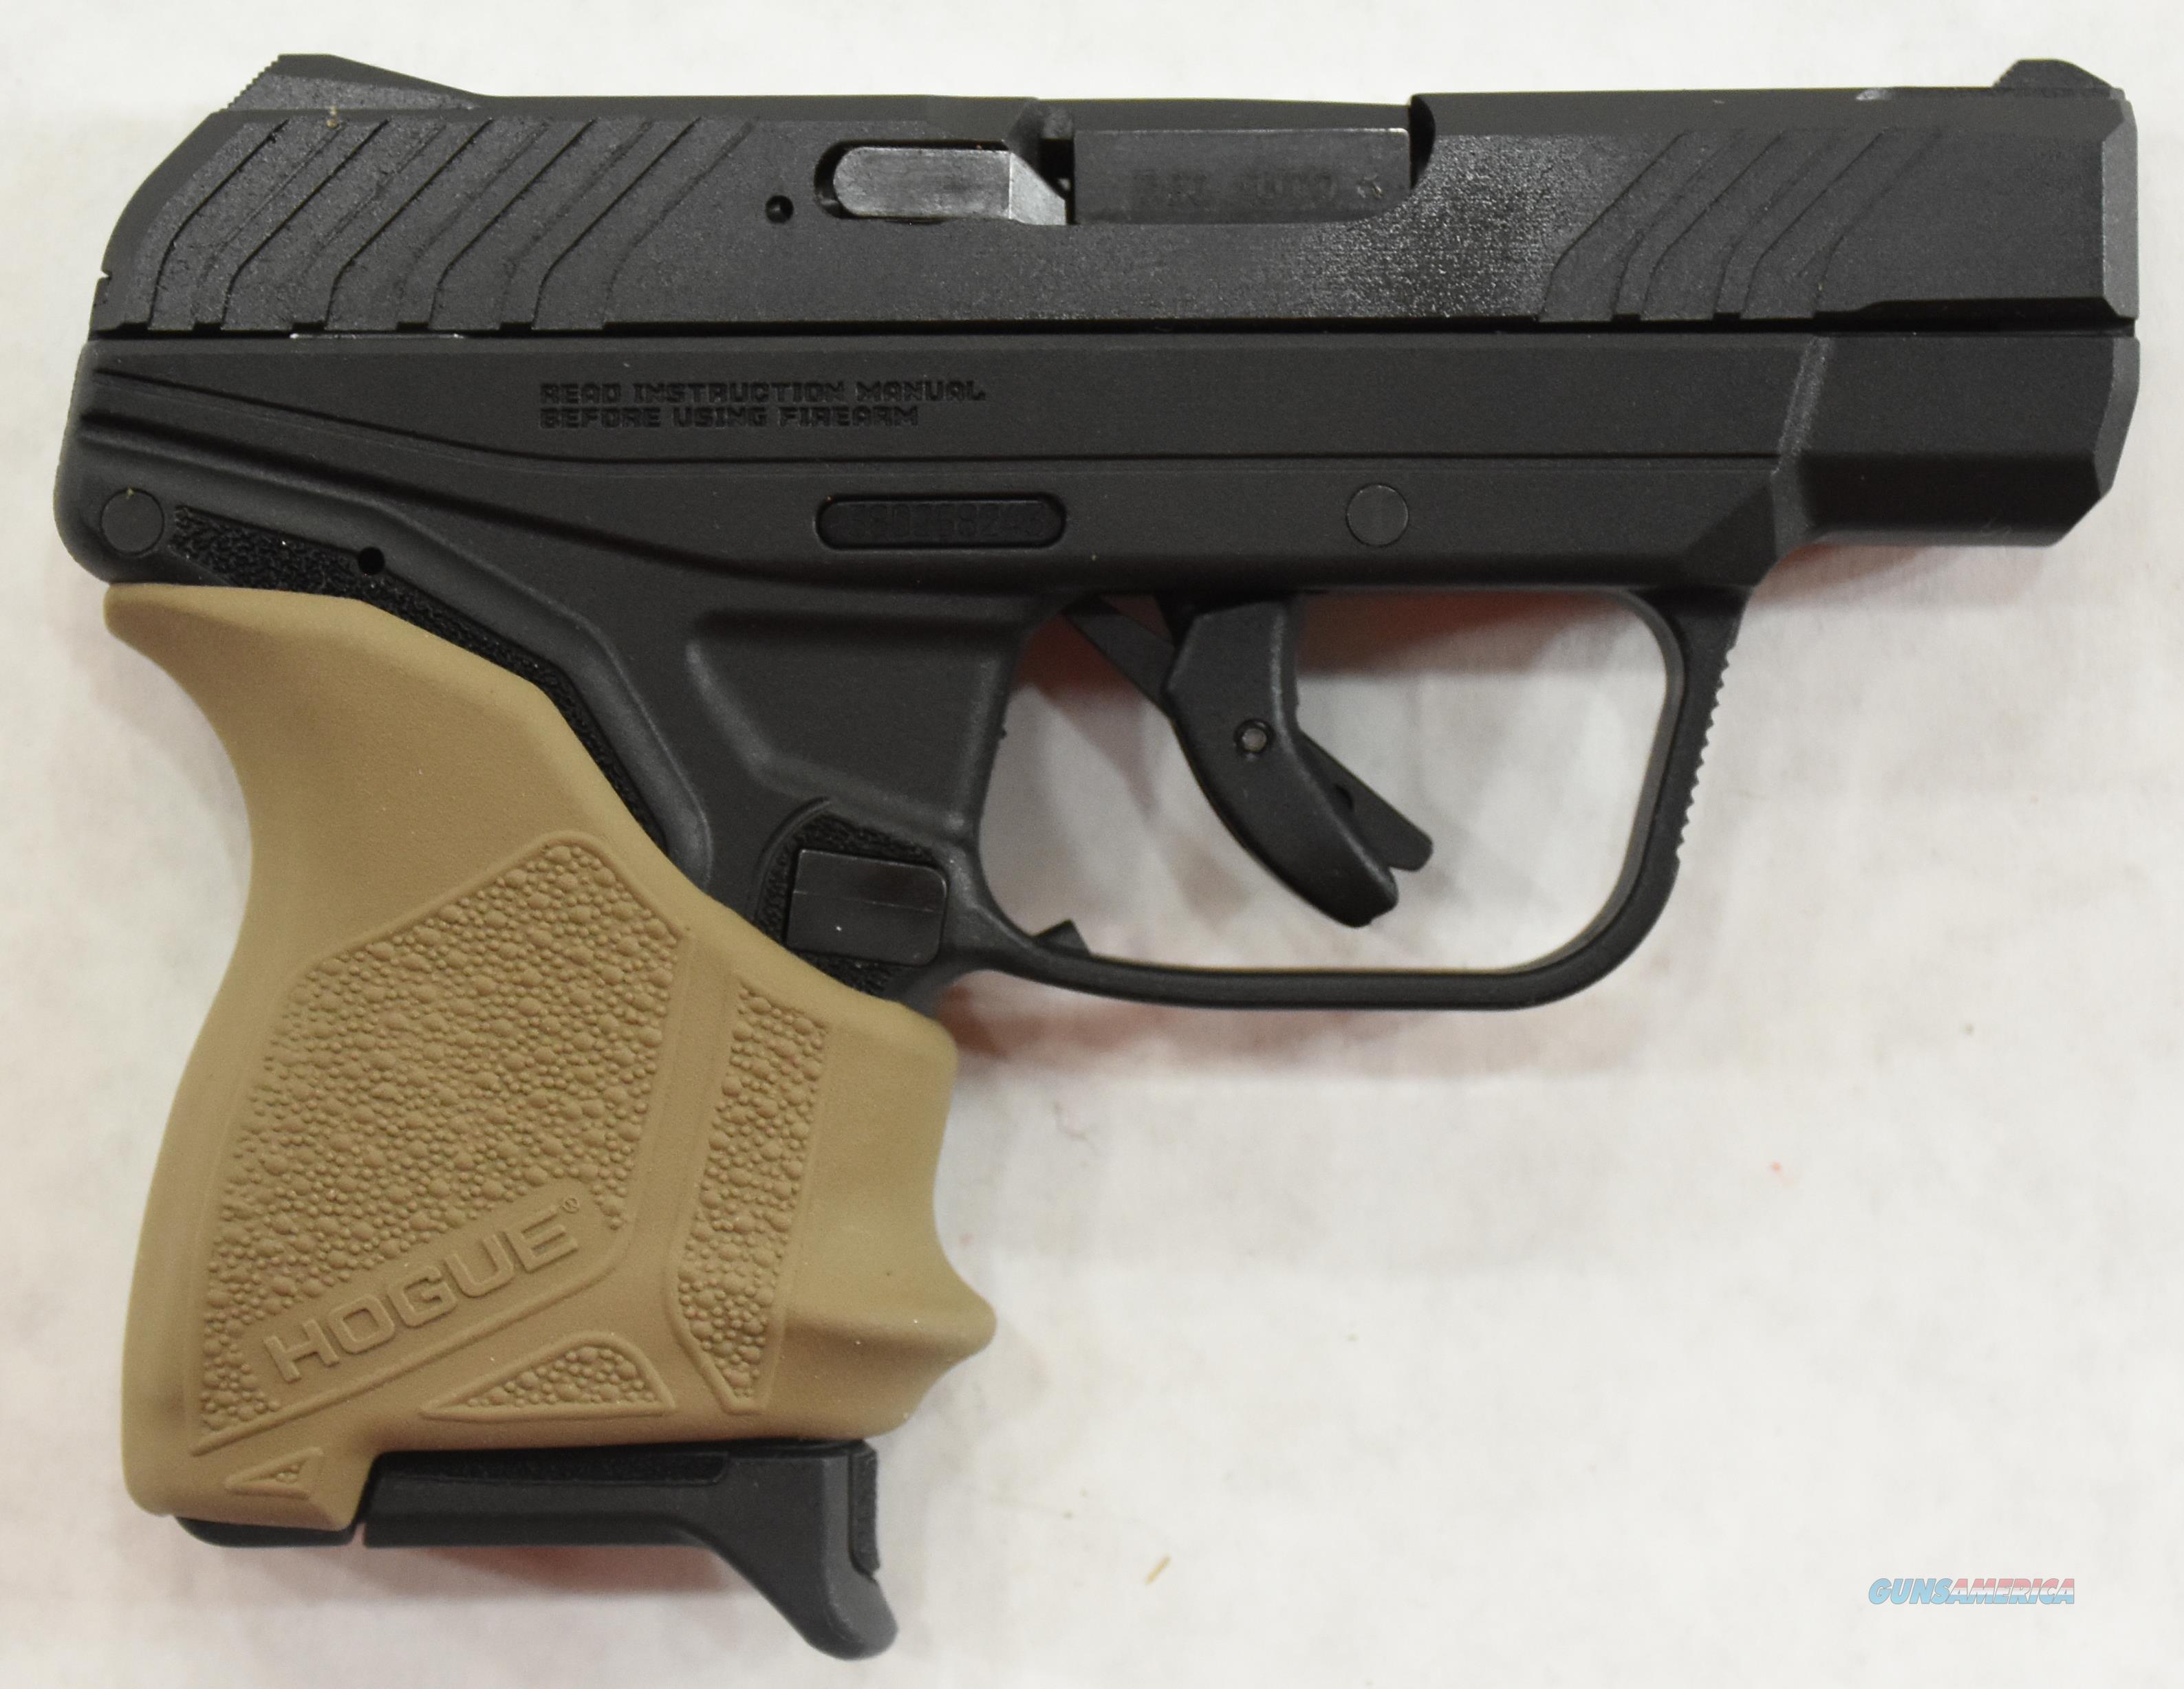 LCP II FDE Hogue Grips 380ACP 2.75In  3773  Guns > Pistols > S Misc Pistols